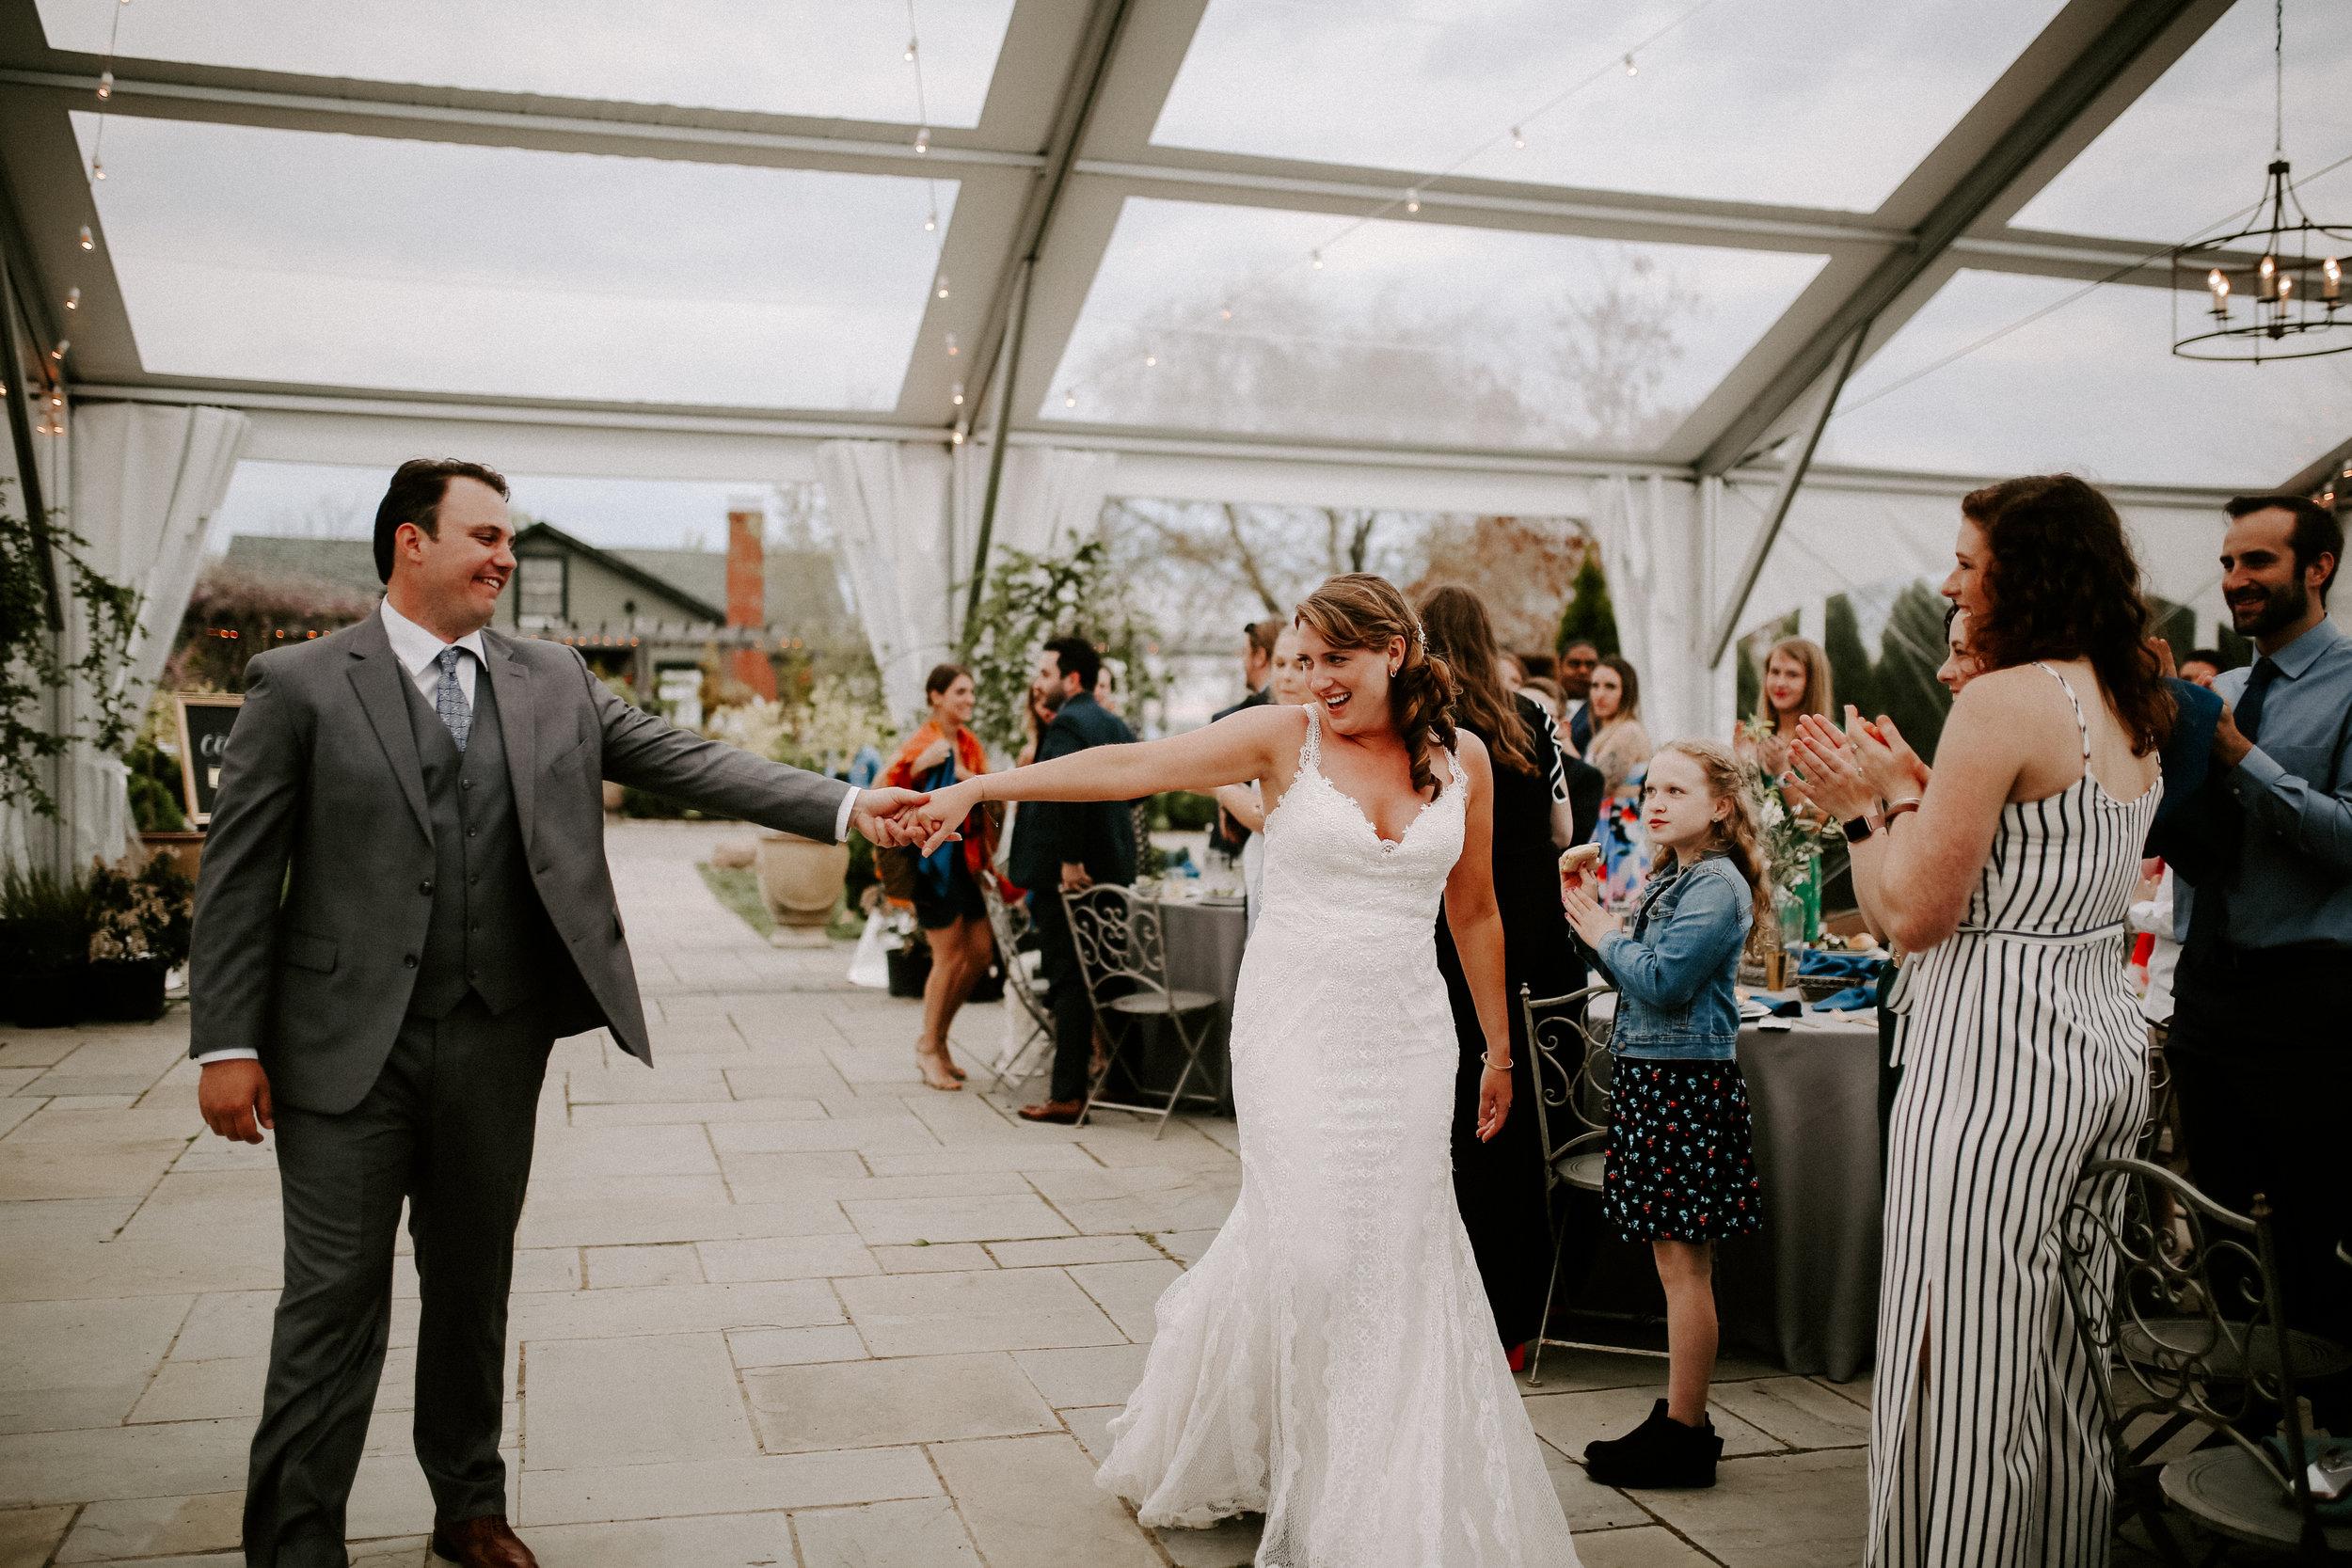 TheGreens_Married_2019-486.jpg